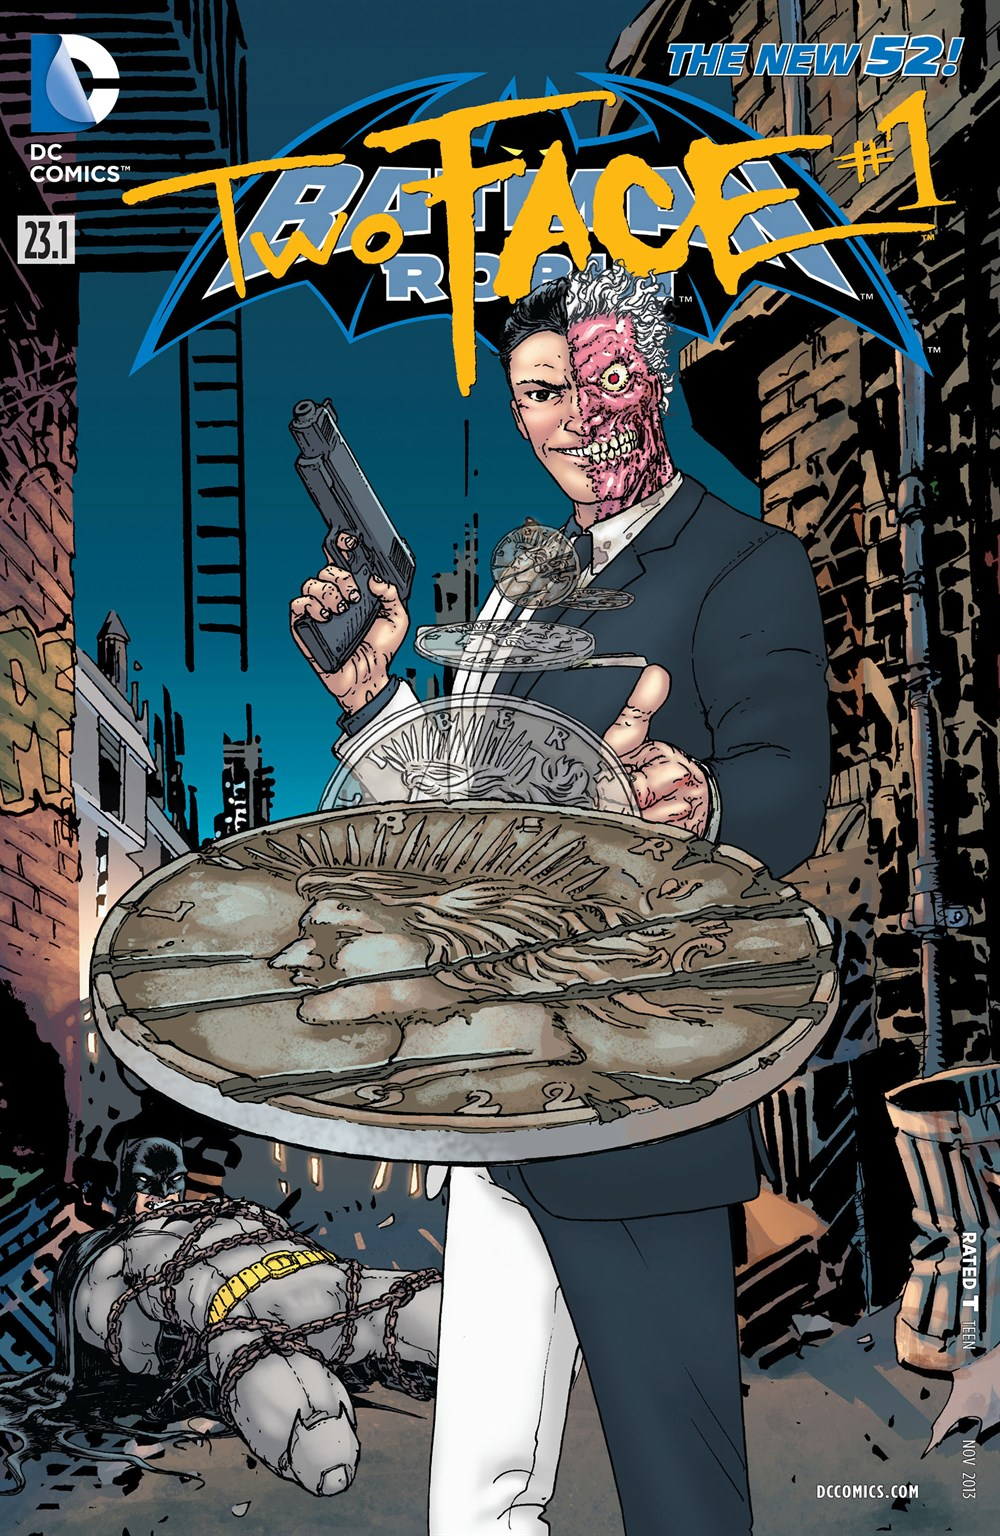 BATMAN ROBIN 23.1 - TWO FACE #1 3D COVER